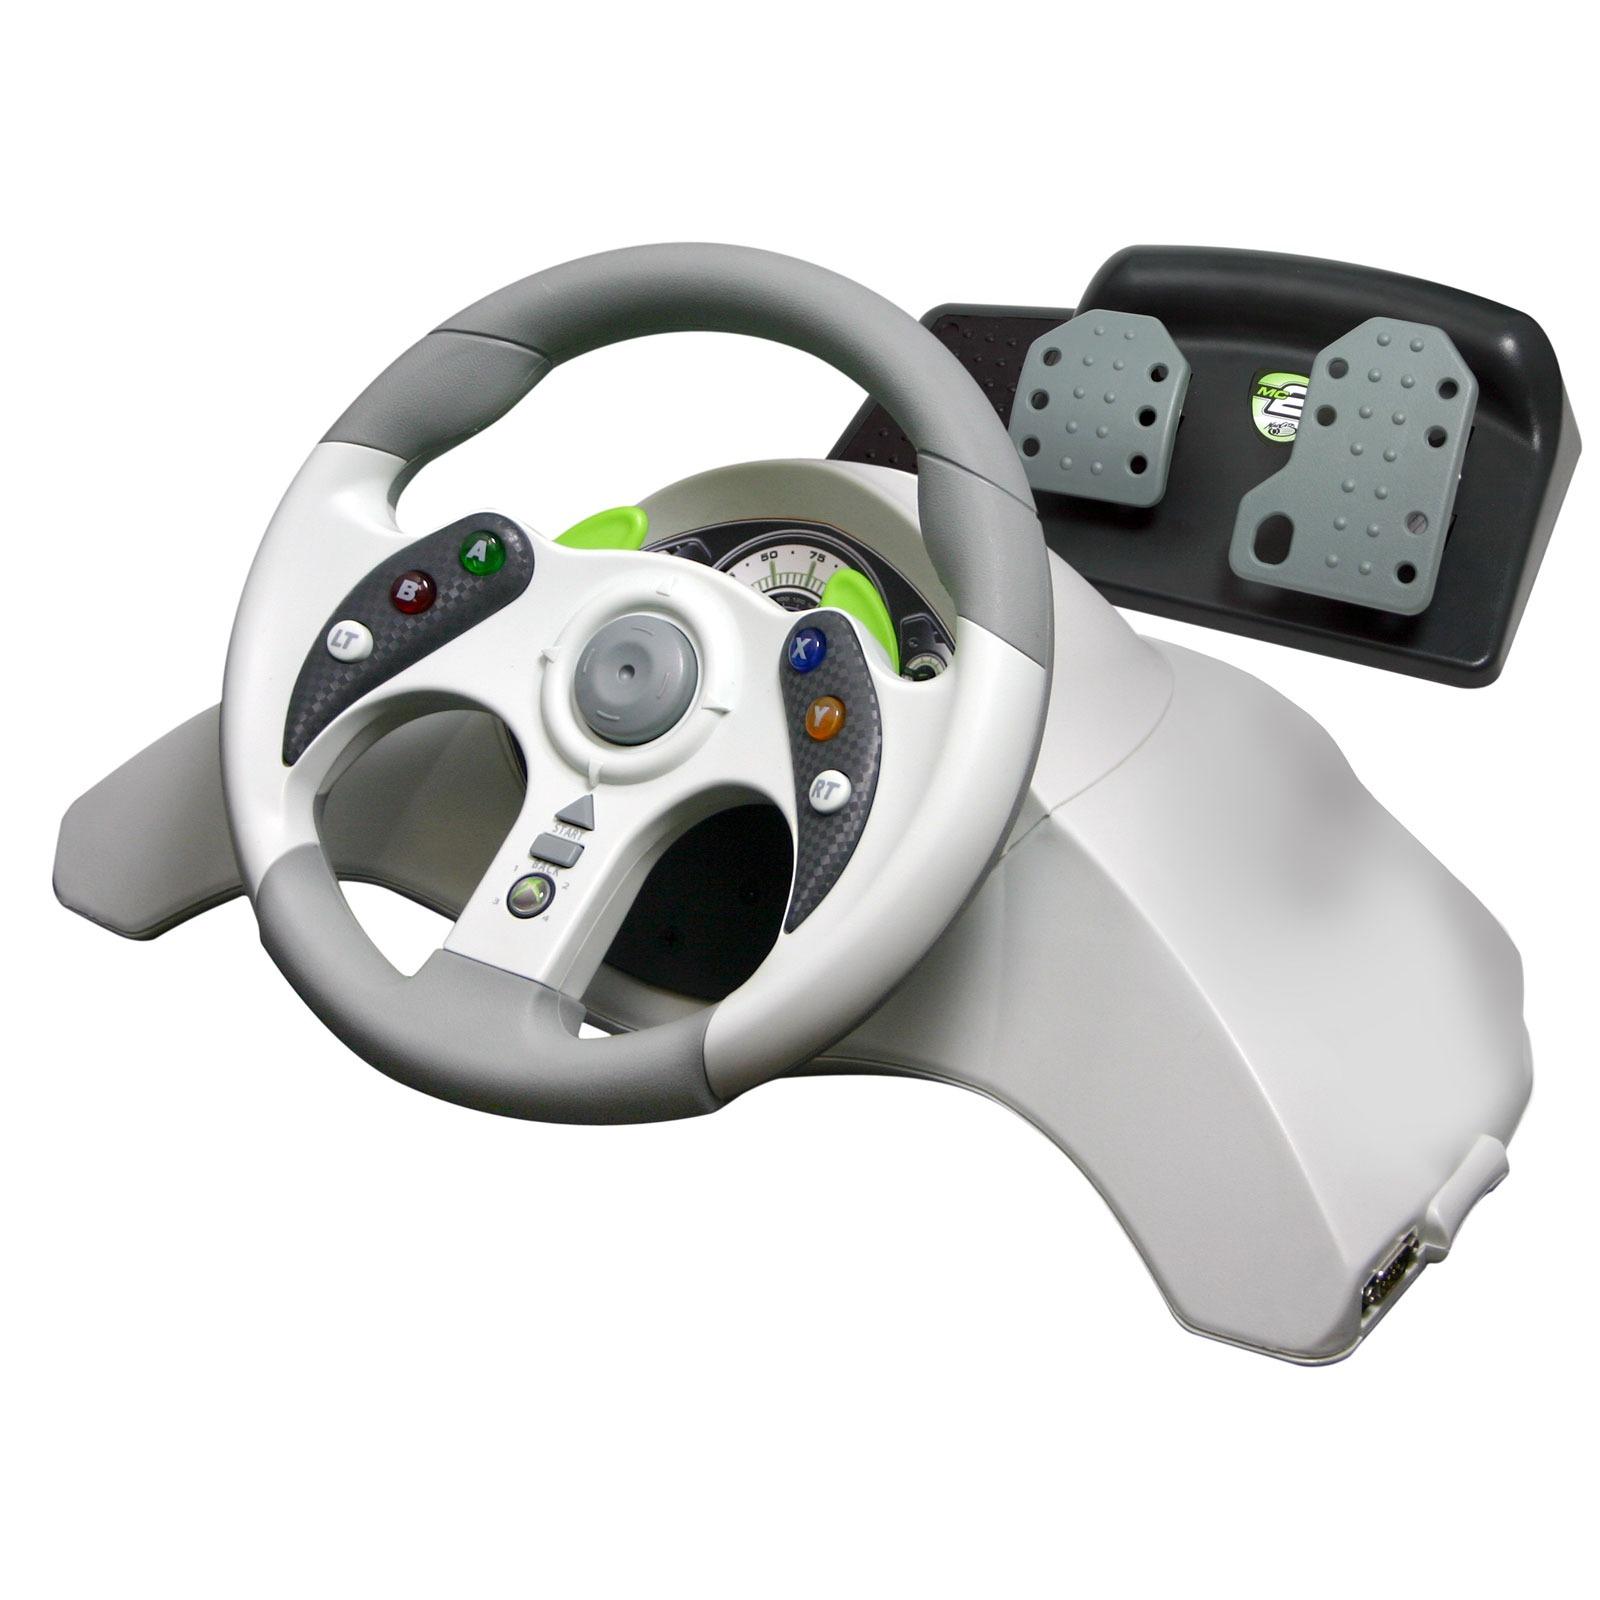 madcatz microcon racing wheel volant pc mad catz sur ldlc. Black Bedroom Furniture Sets. Home Design Ideas